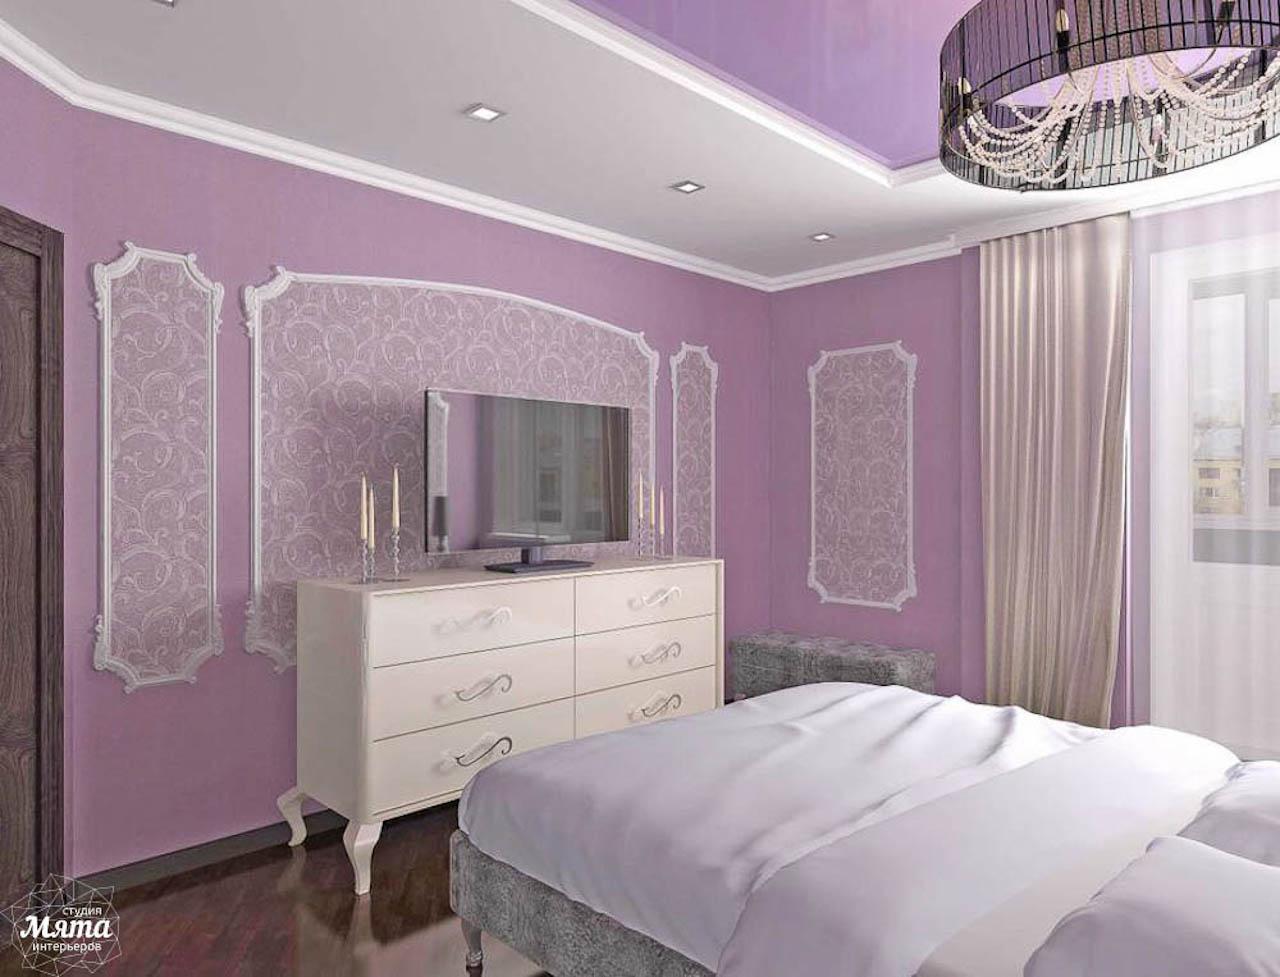 Дизайн интерьера двухкомнатной квартиры по ул. Юмашева 10 img375180099